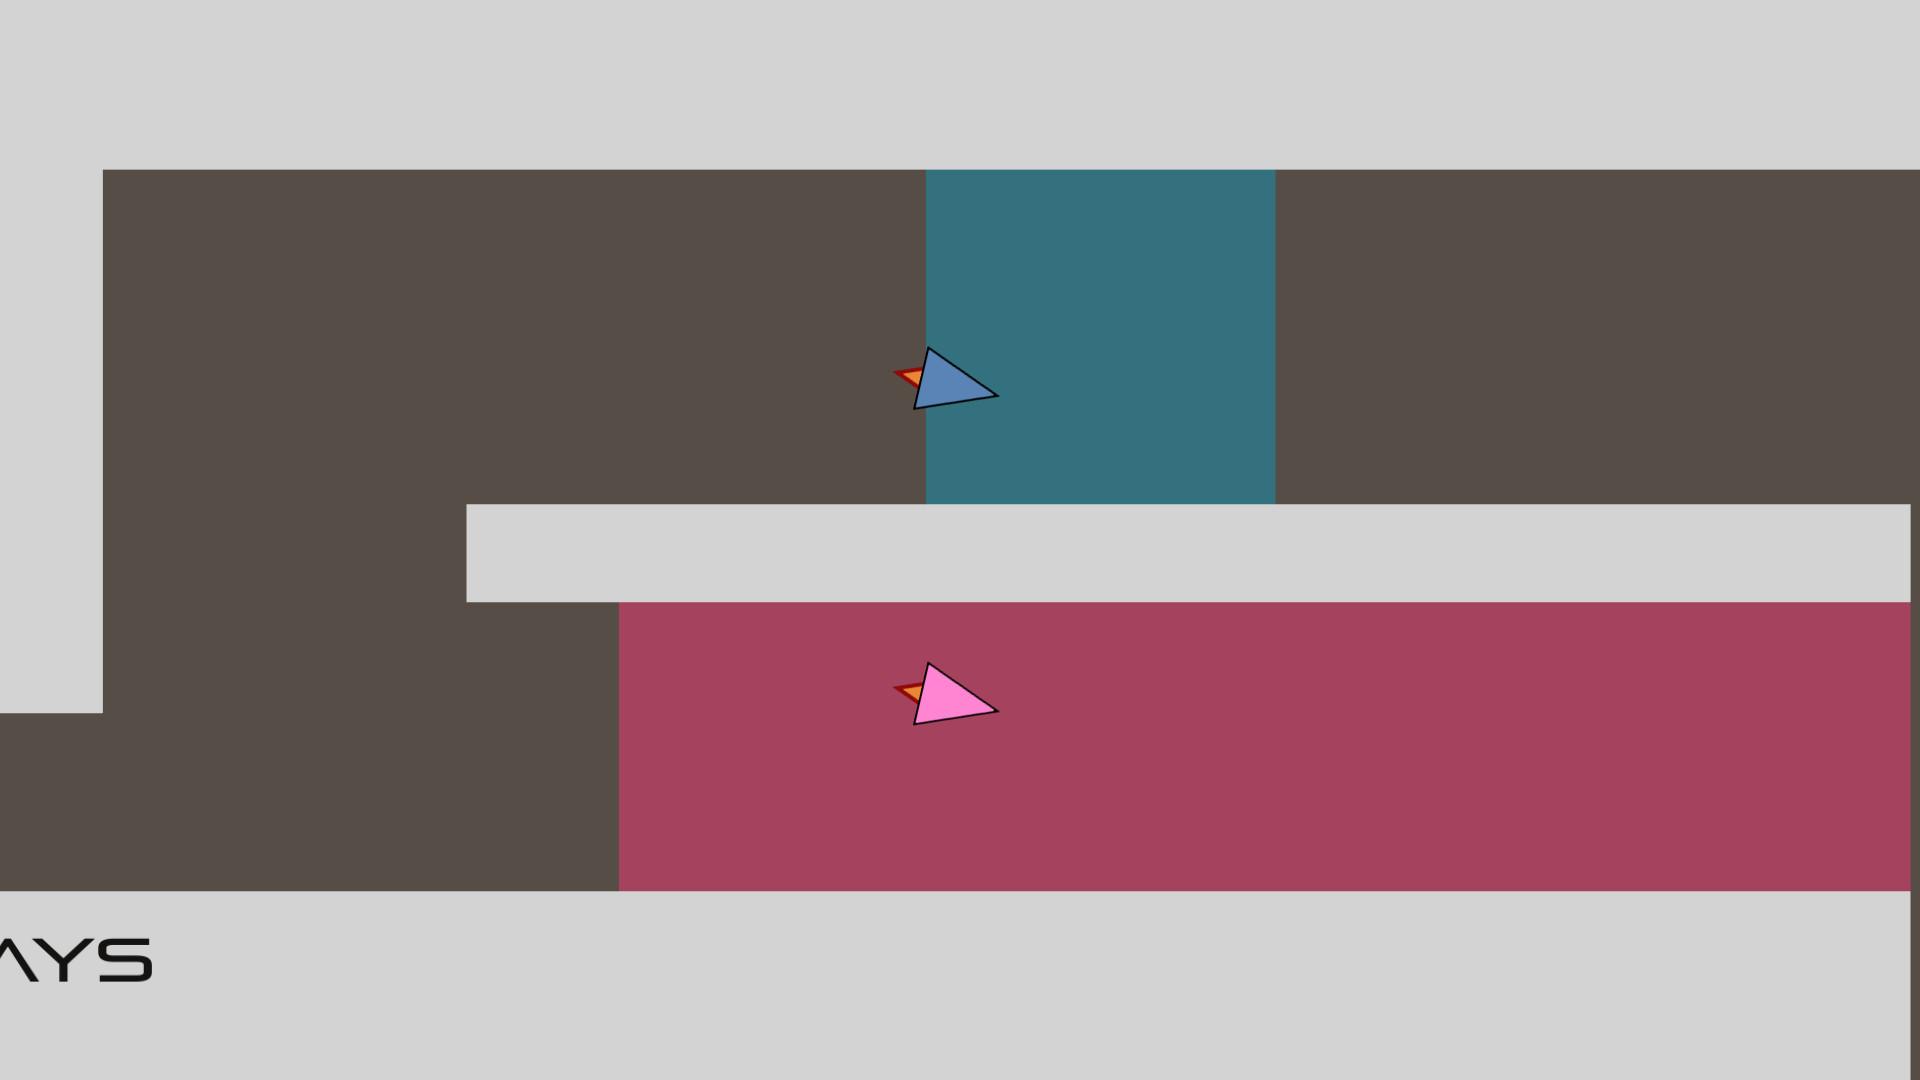 Trianguluv screenshot